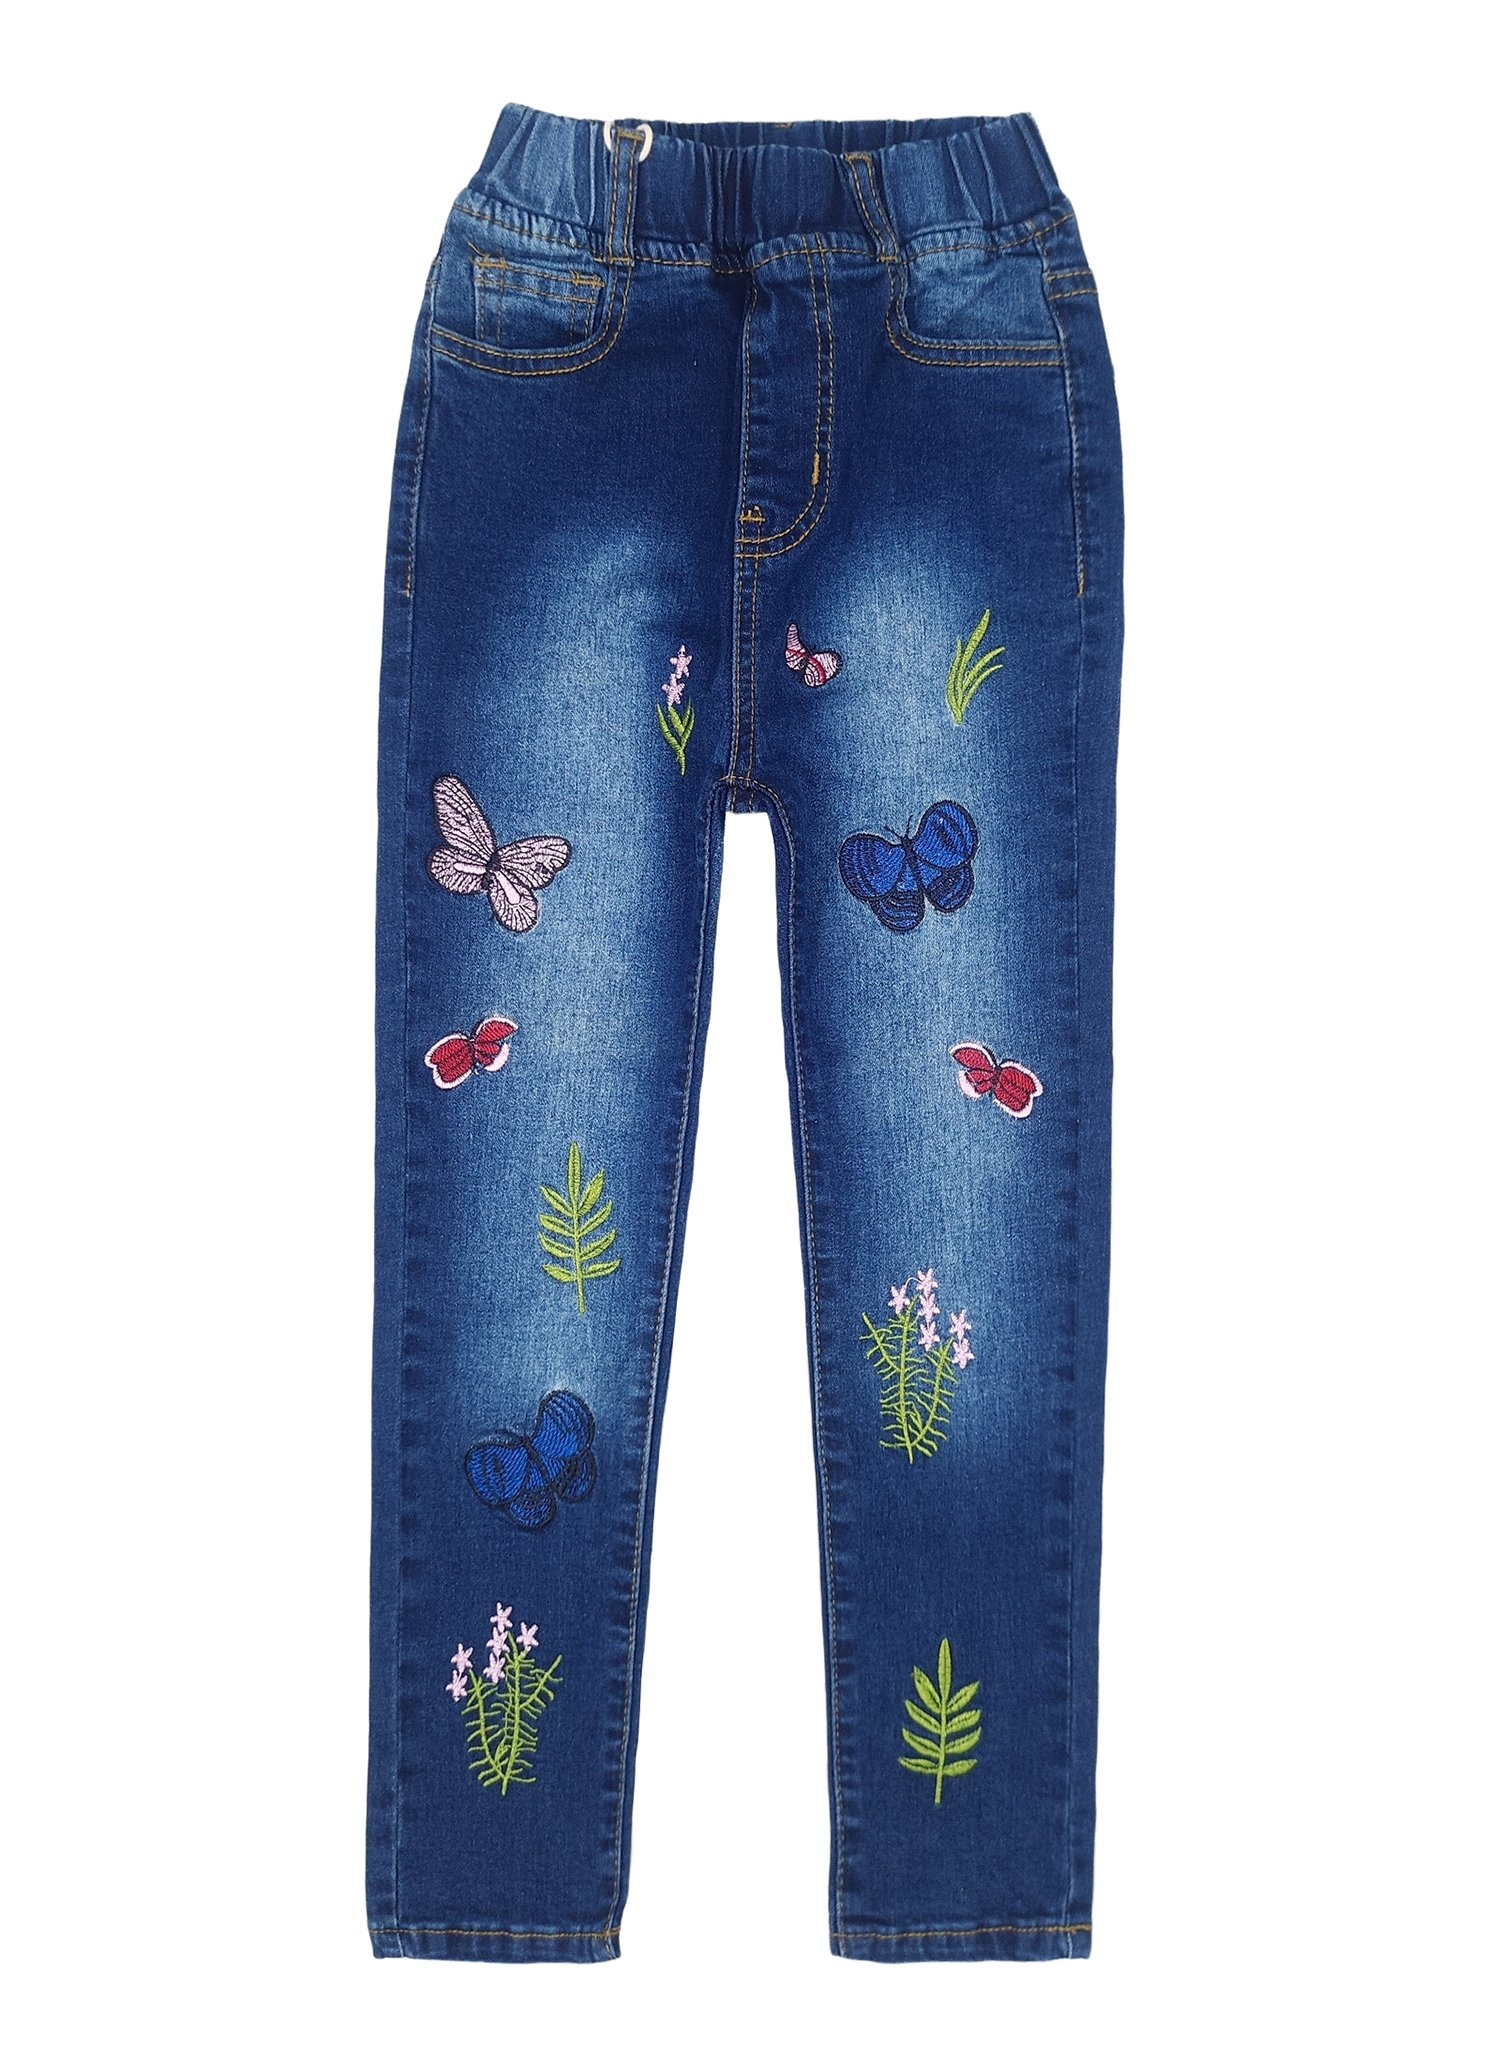 Kidscool Girls Embroiderd Grass Jeans Pants